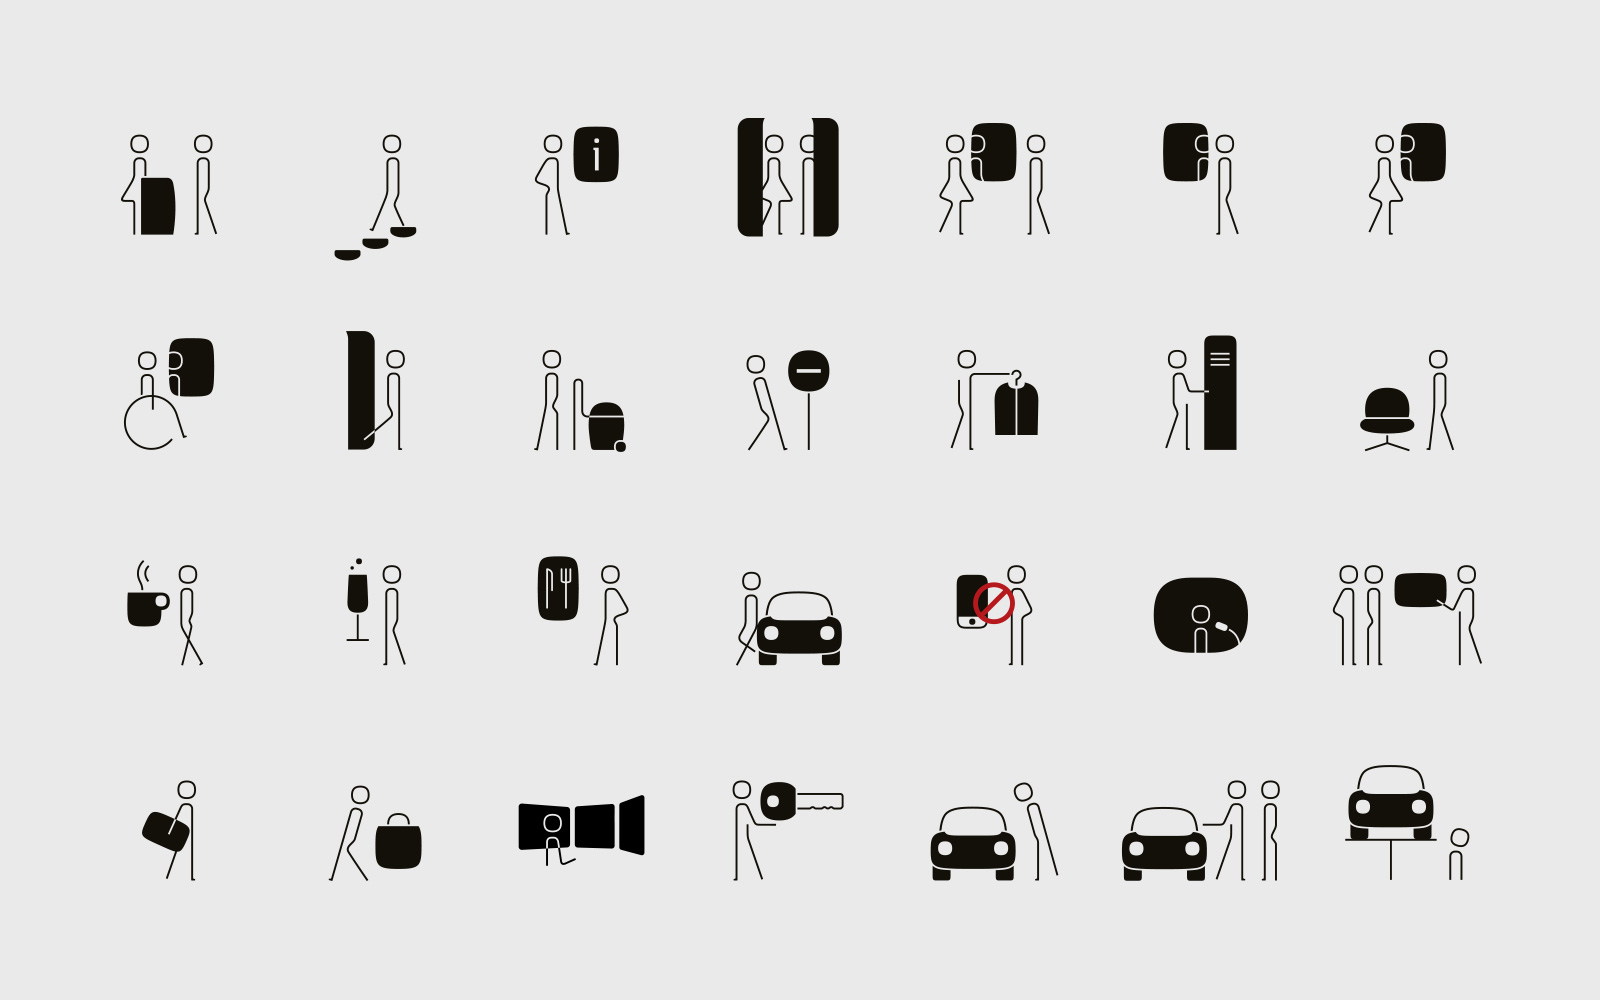 Pictogrammes Renault 2015 pictogrammes